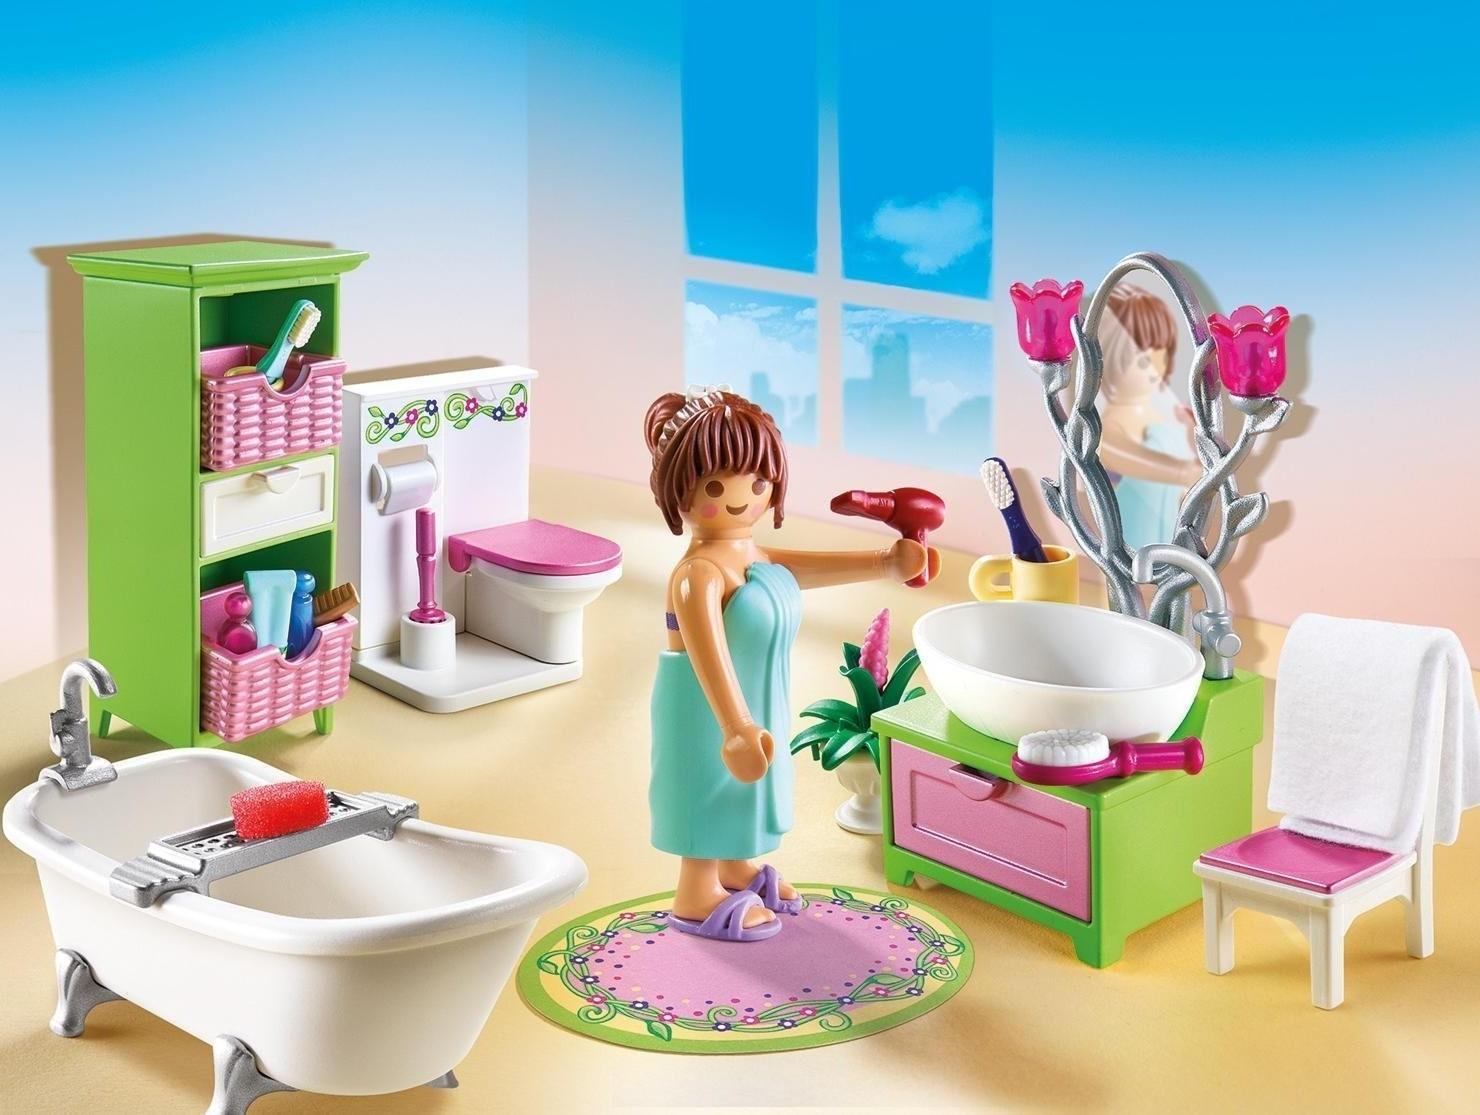 Salle de bains Playmobil.